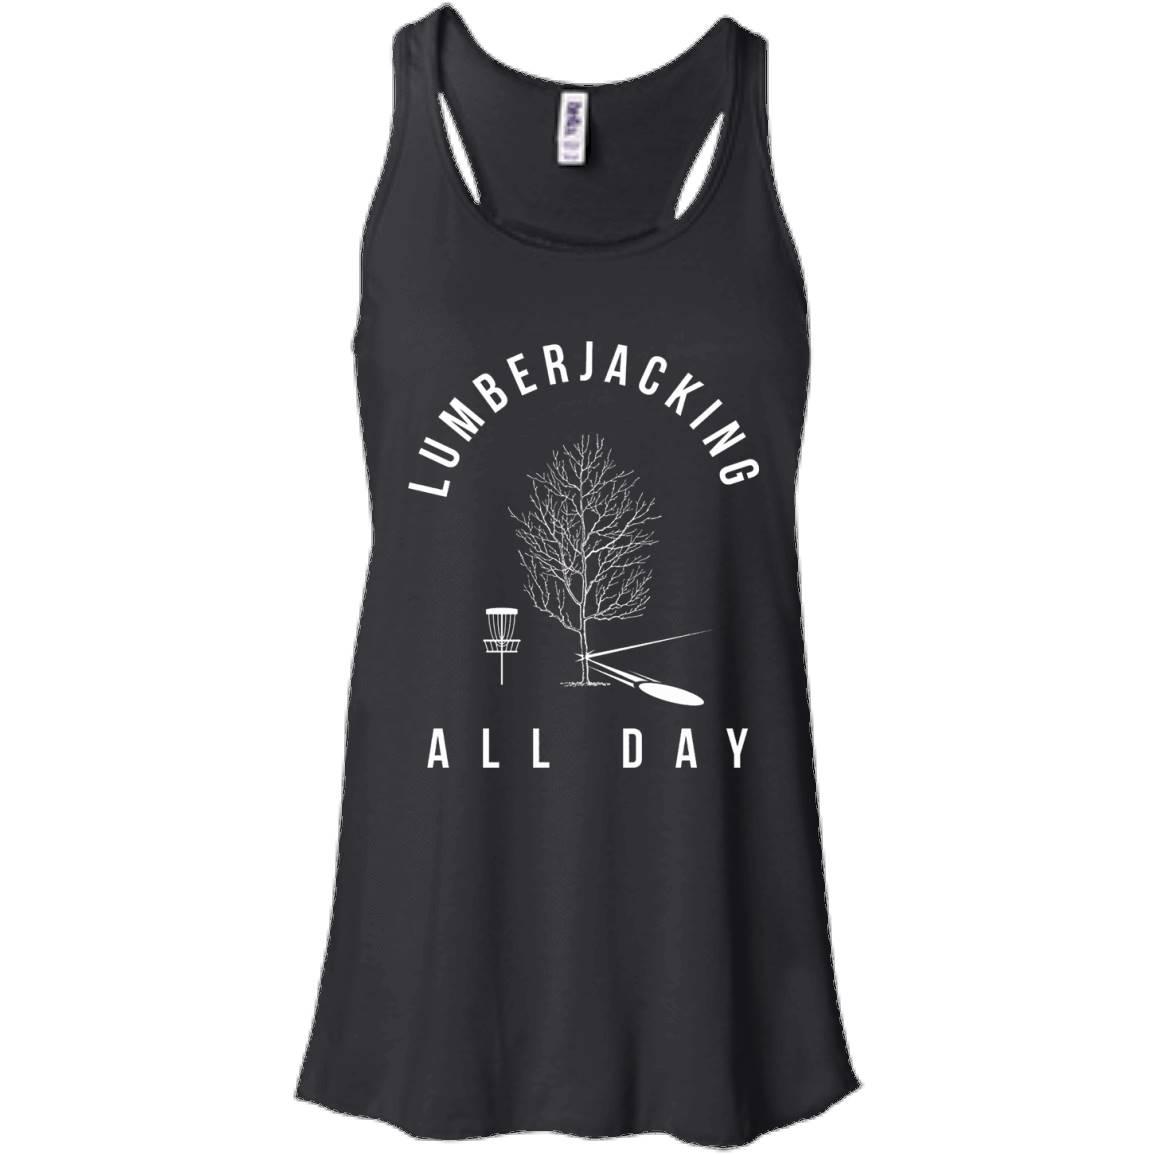 Lumberjacking All Day Disc Golf Shirt, Funny Sports Gift – Women Tank